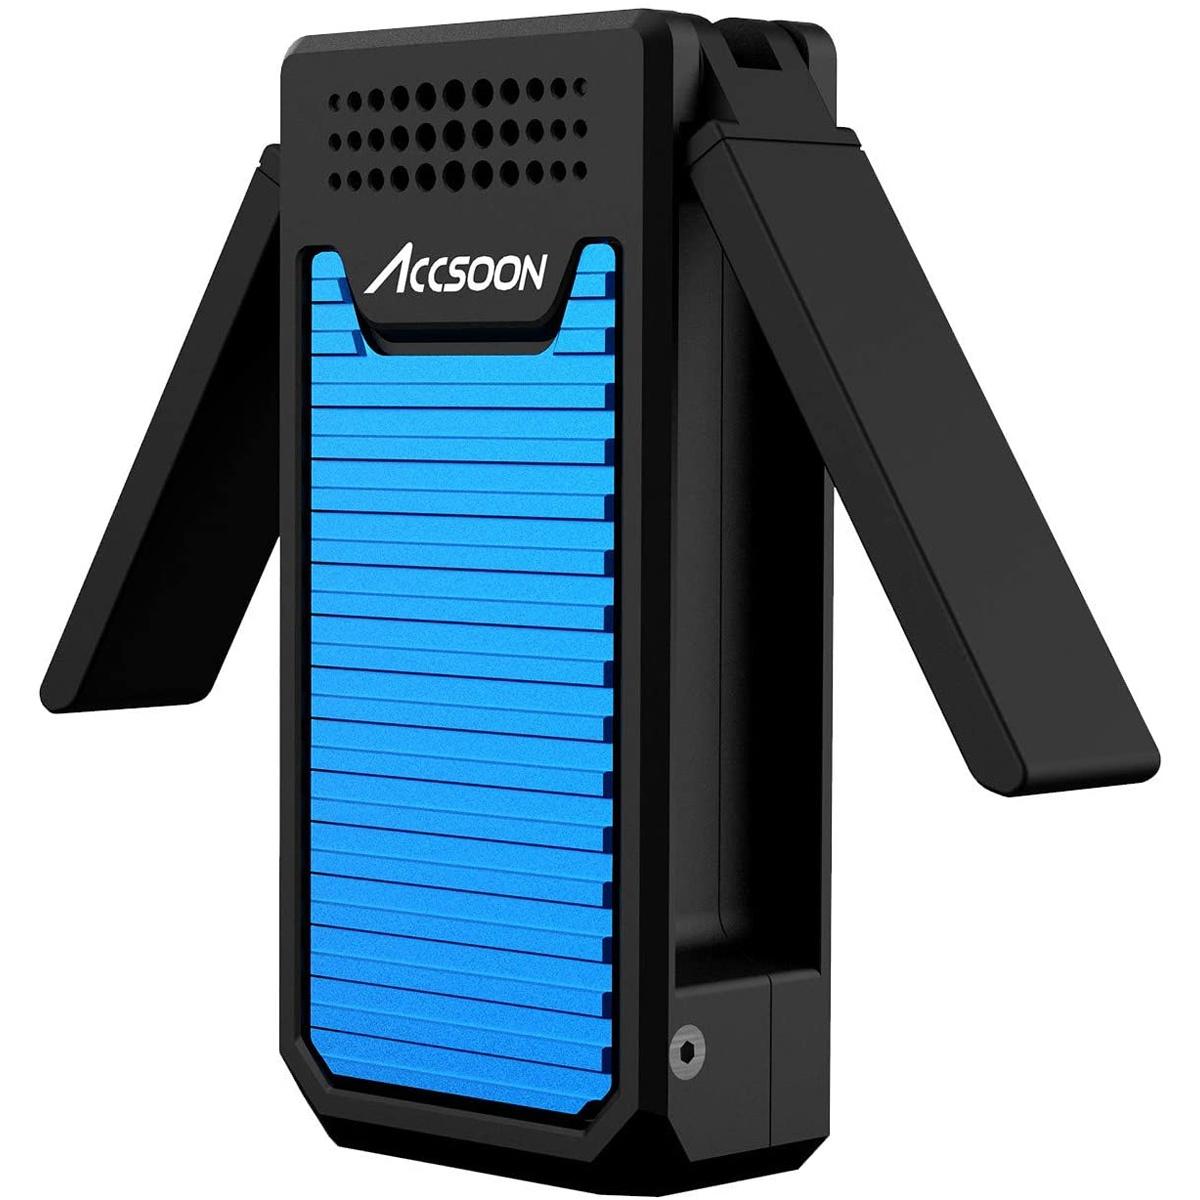 Accsoon Cineeye Air WIFI Transmitter